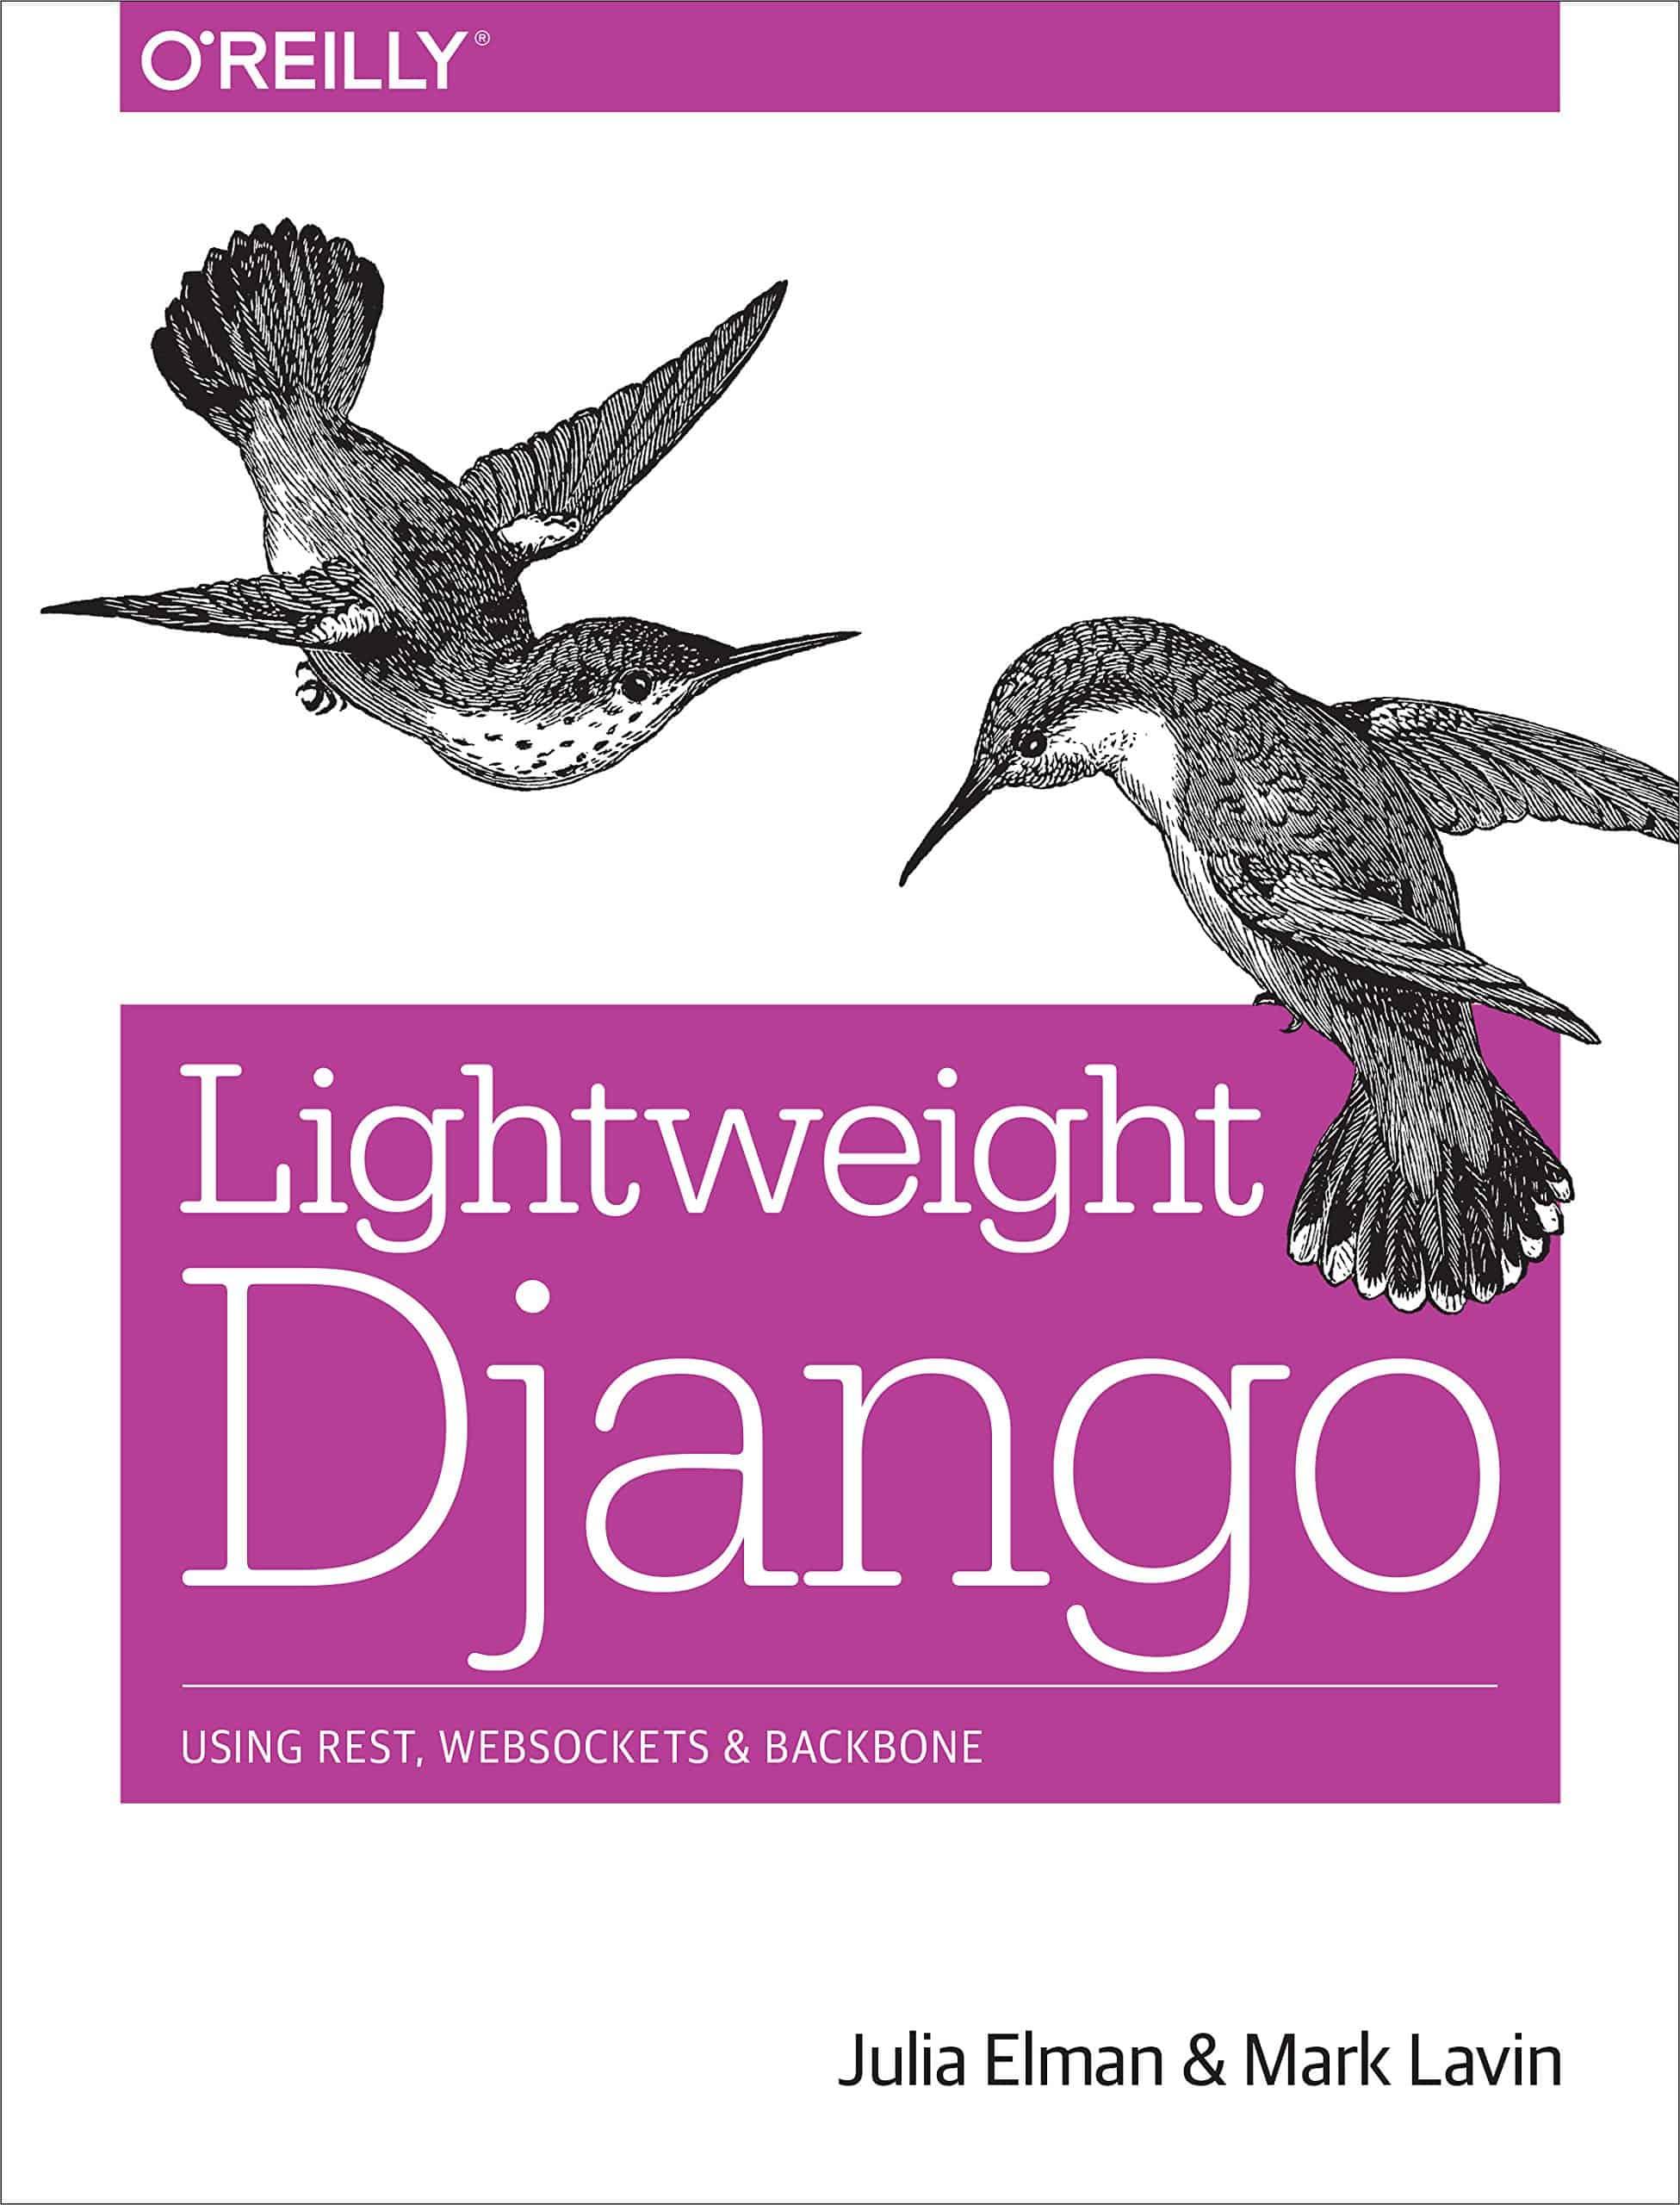 Personal experiments on Django